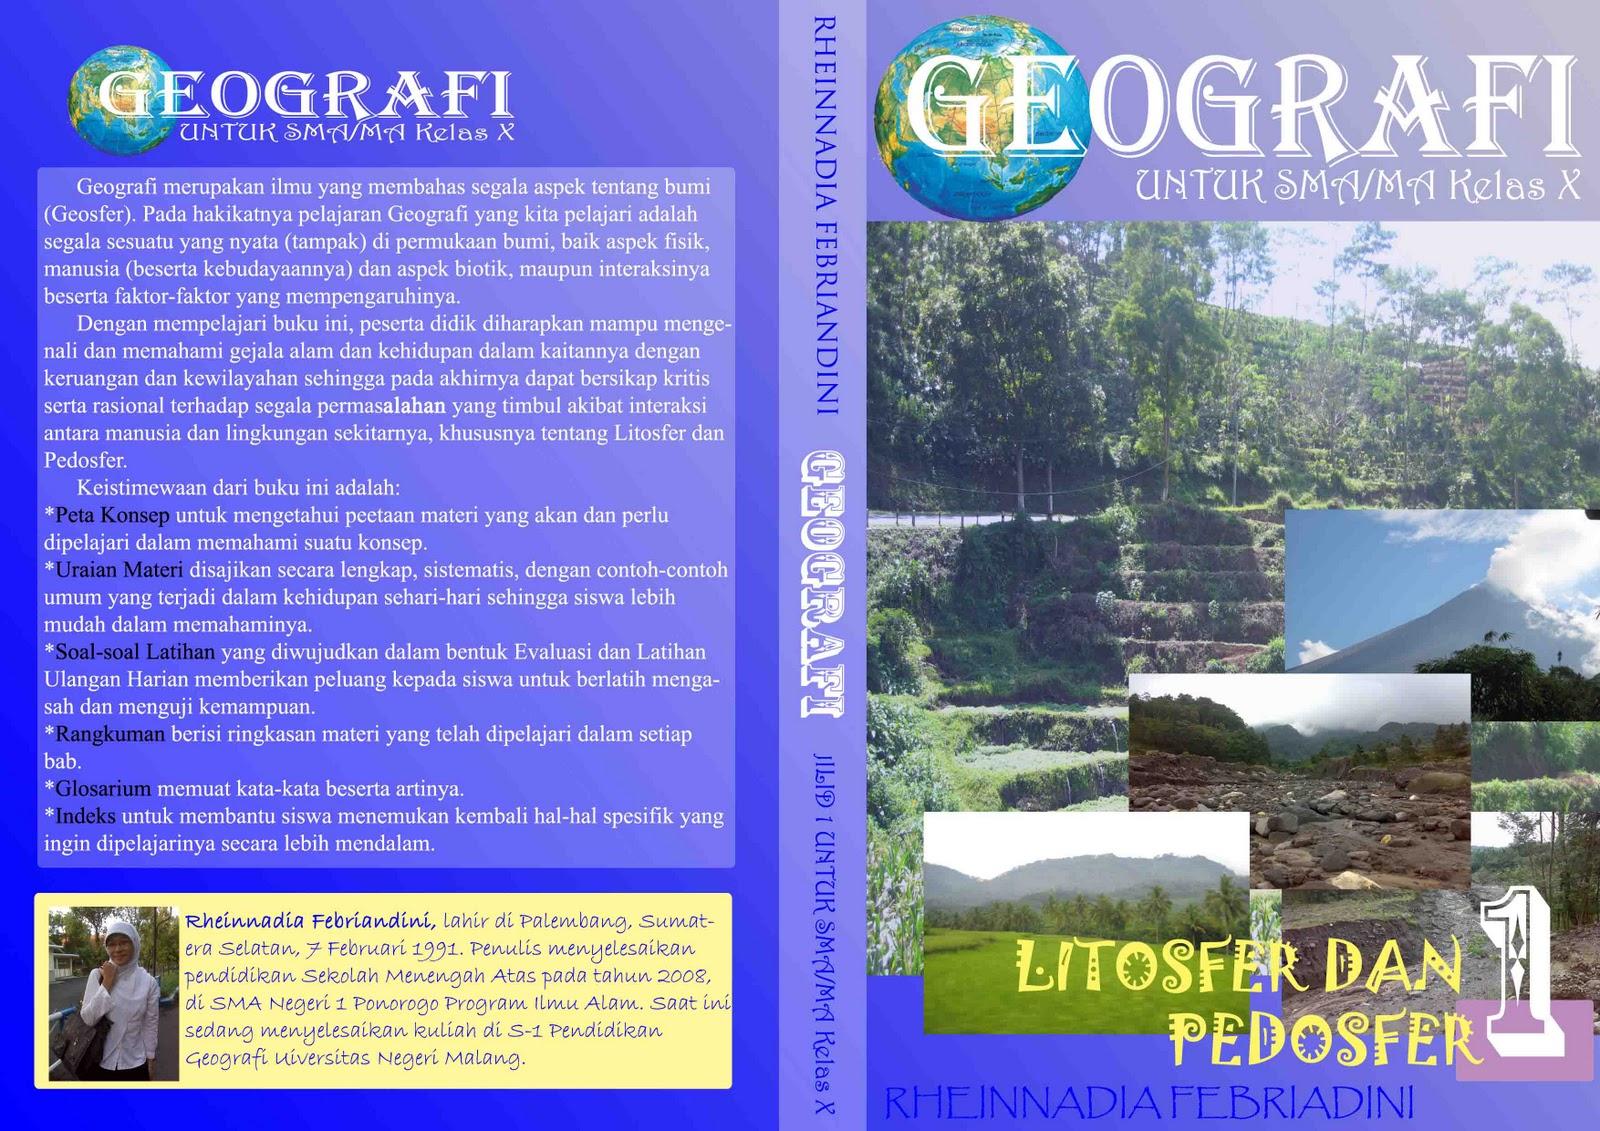 Rheinnadia in Geography: Layout Buku Geografi: Bab III